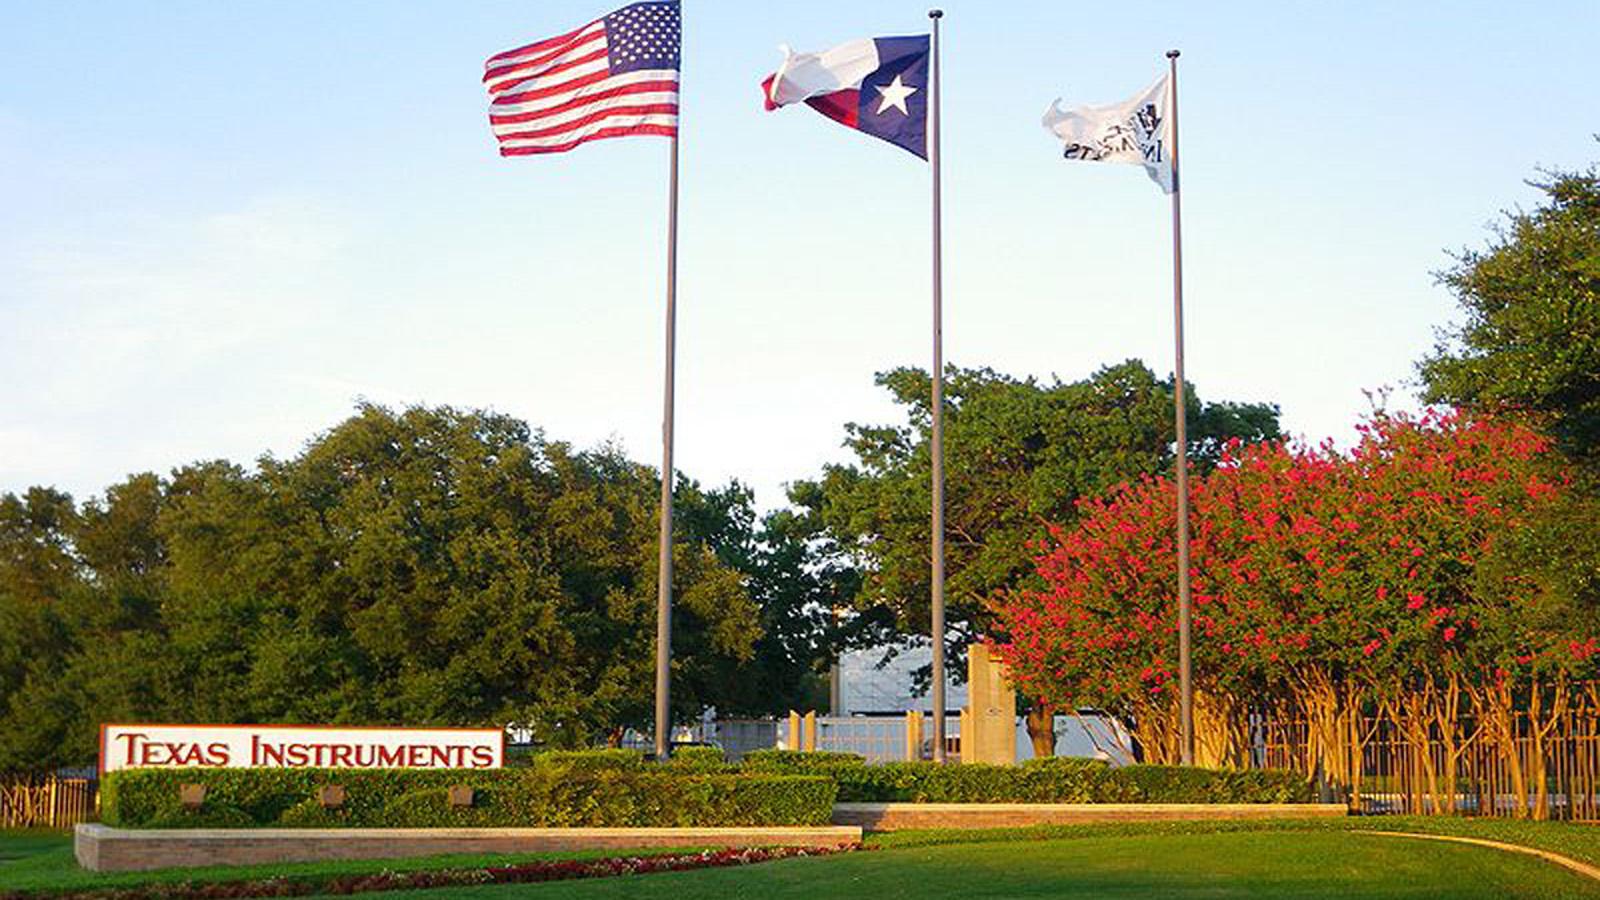 TX_Dallas_TexasInstrumentsHQ_signature_2009_01